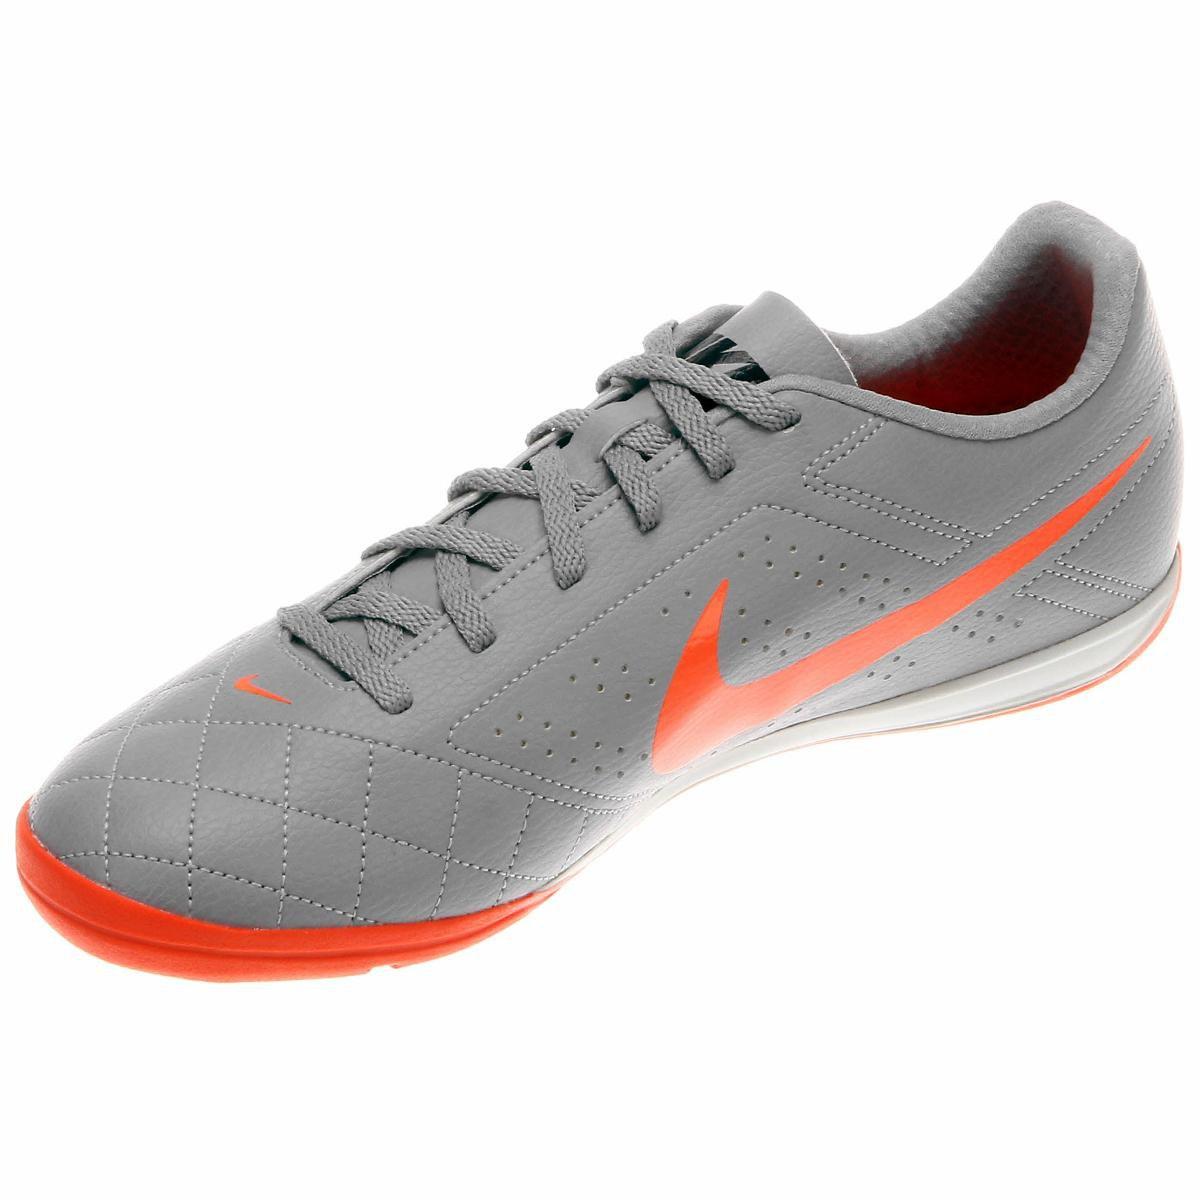 2ff9d77c11 Chuteira Futsal Nike Beco 2 Futsal - Cinza e Laranja - Compre Agora ...